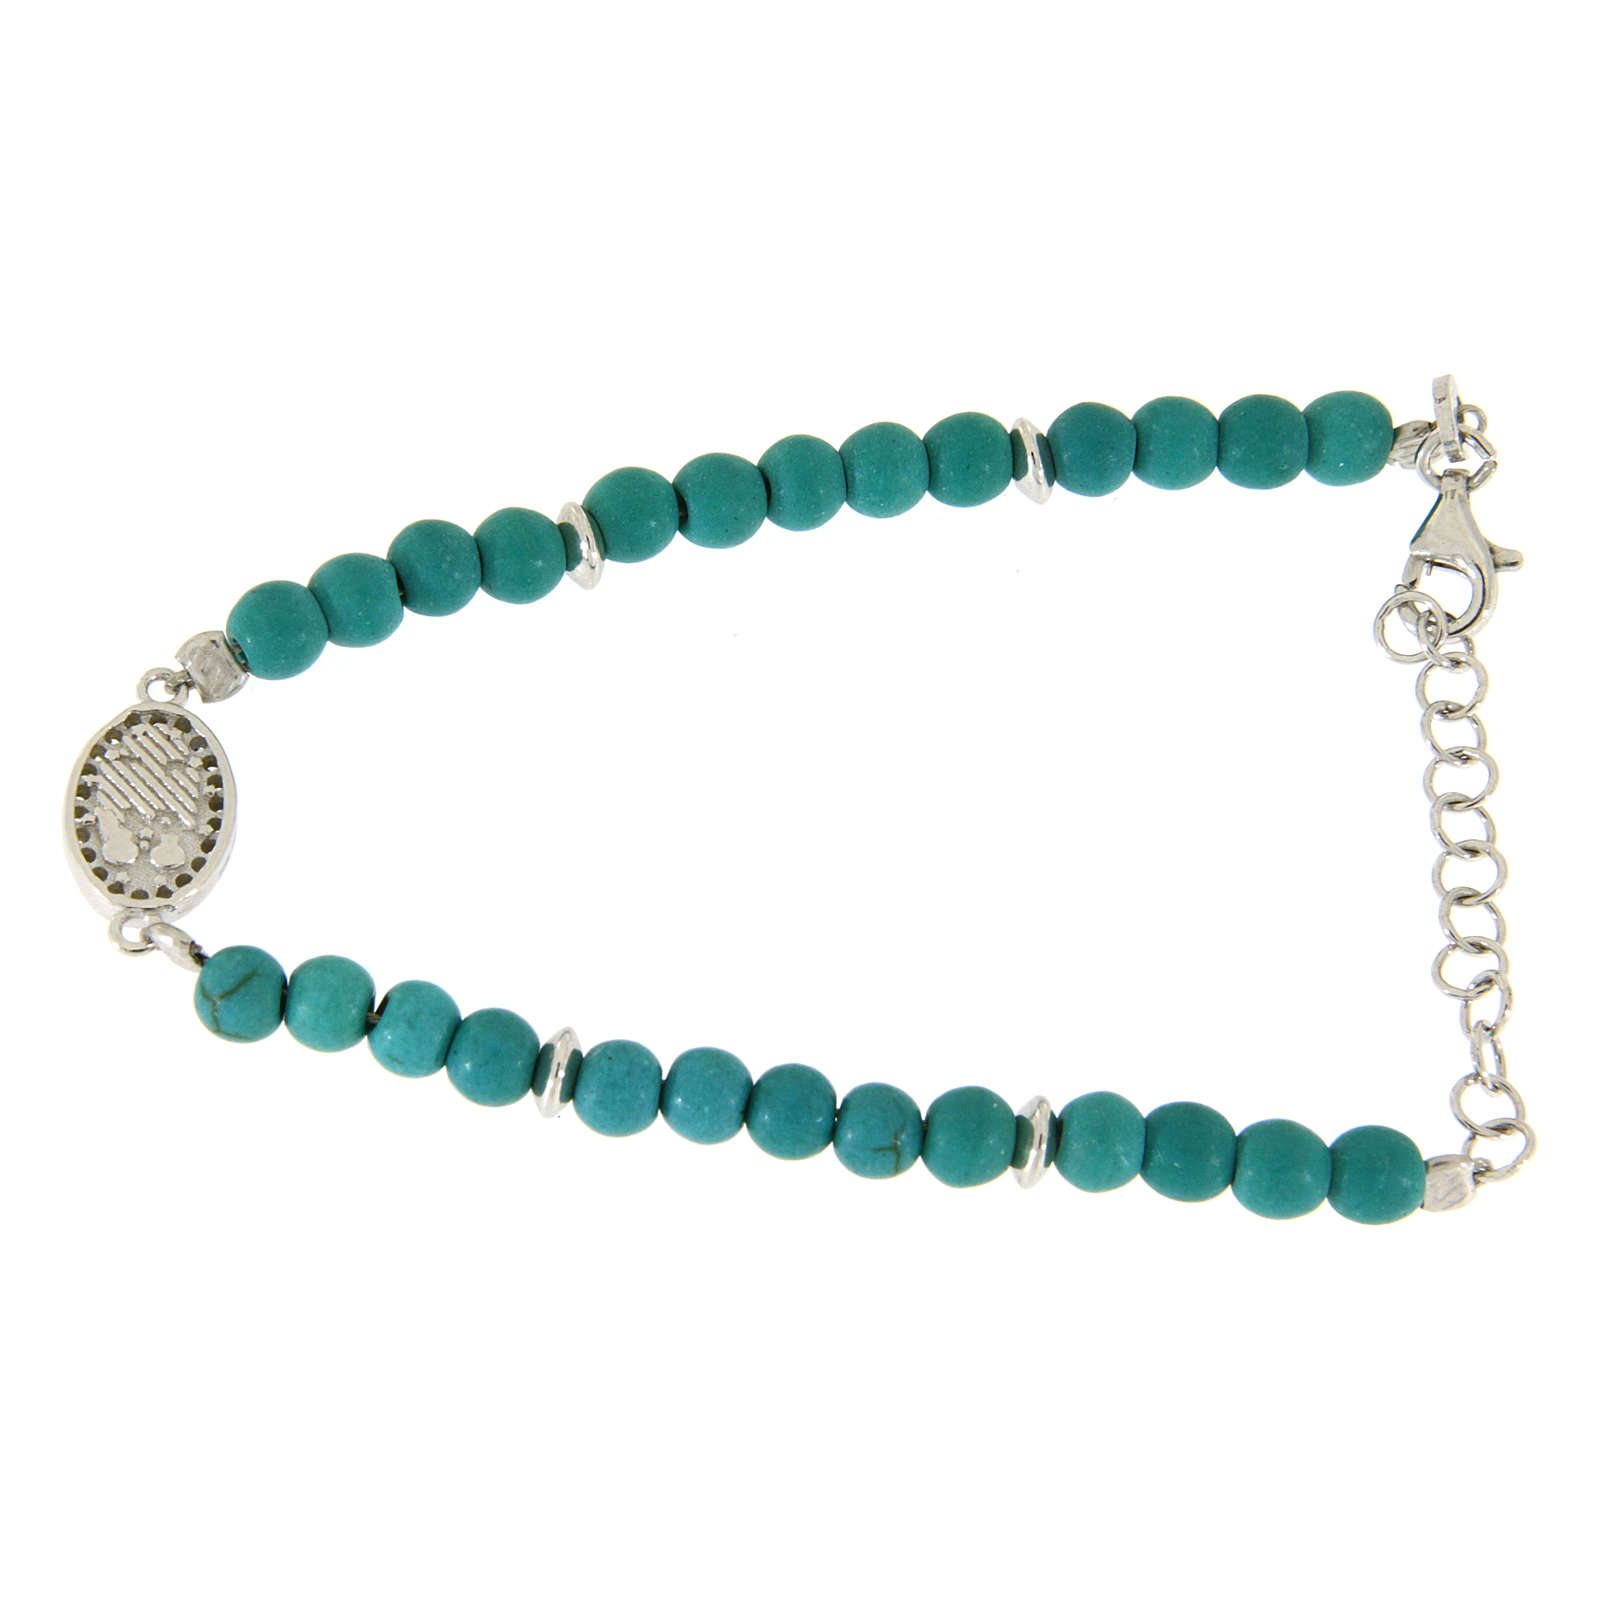 Bracciale perline pasta turchese medaglia S. Rita zirconi bianchi - argento 925 4